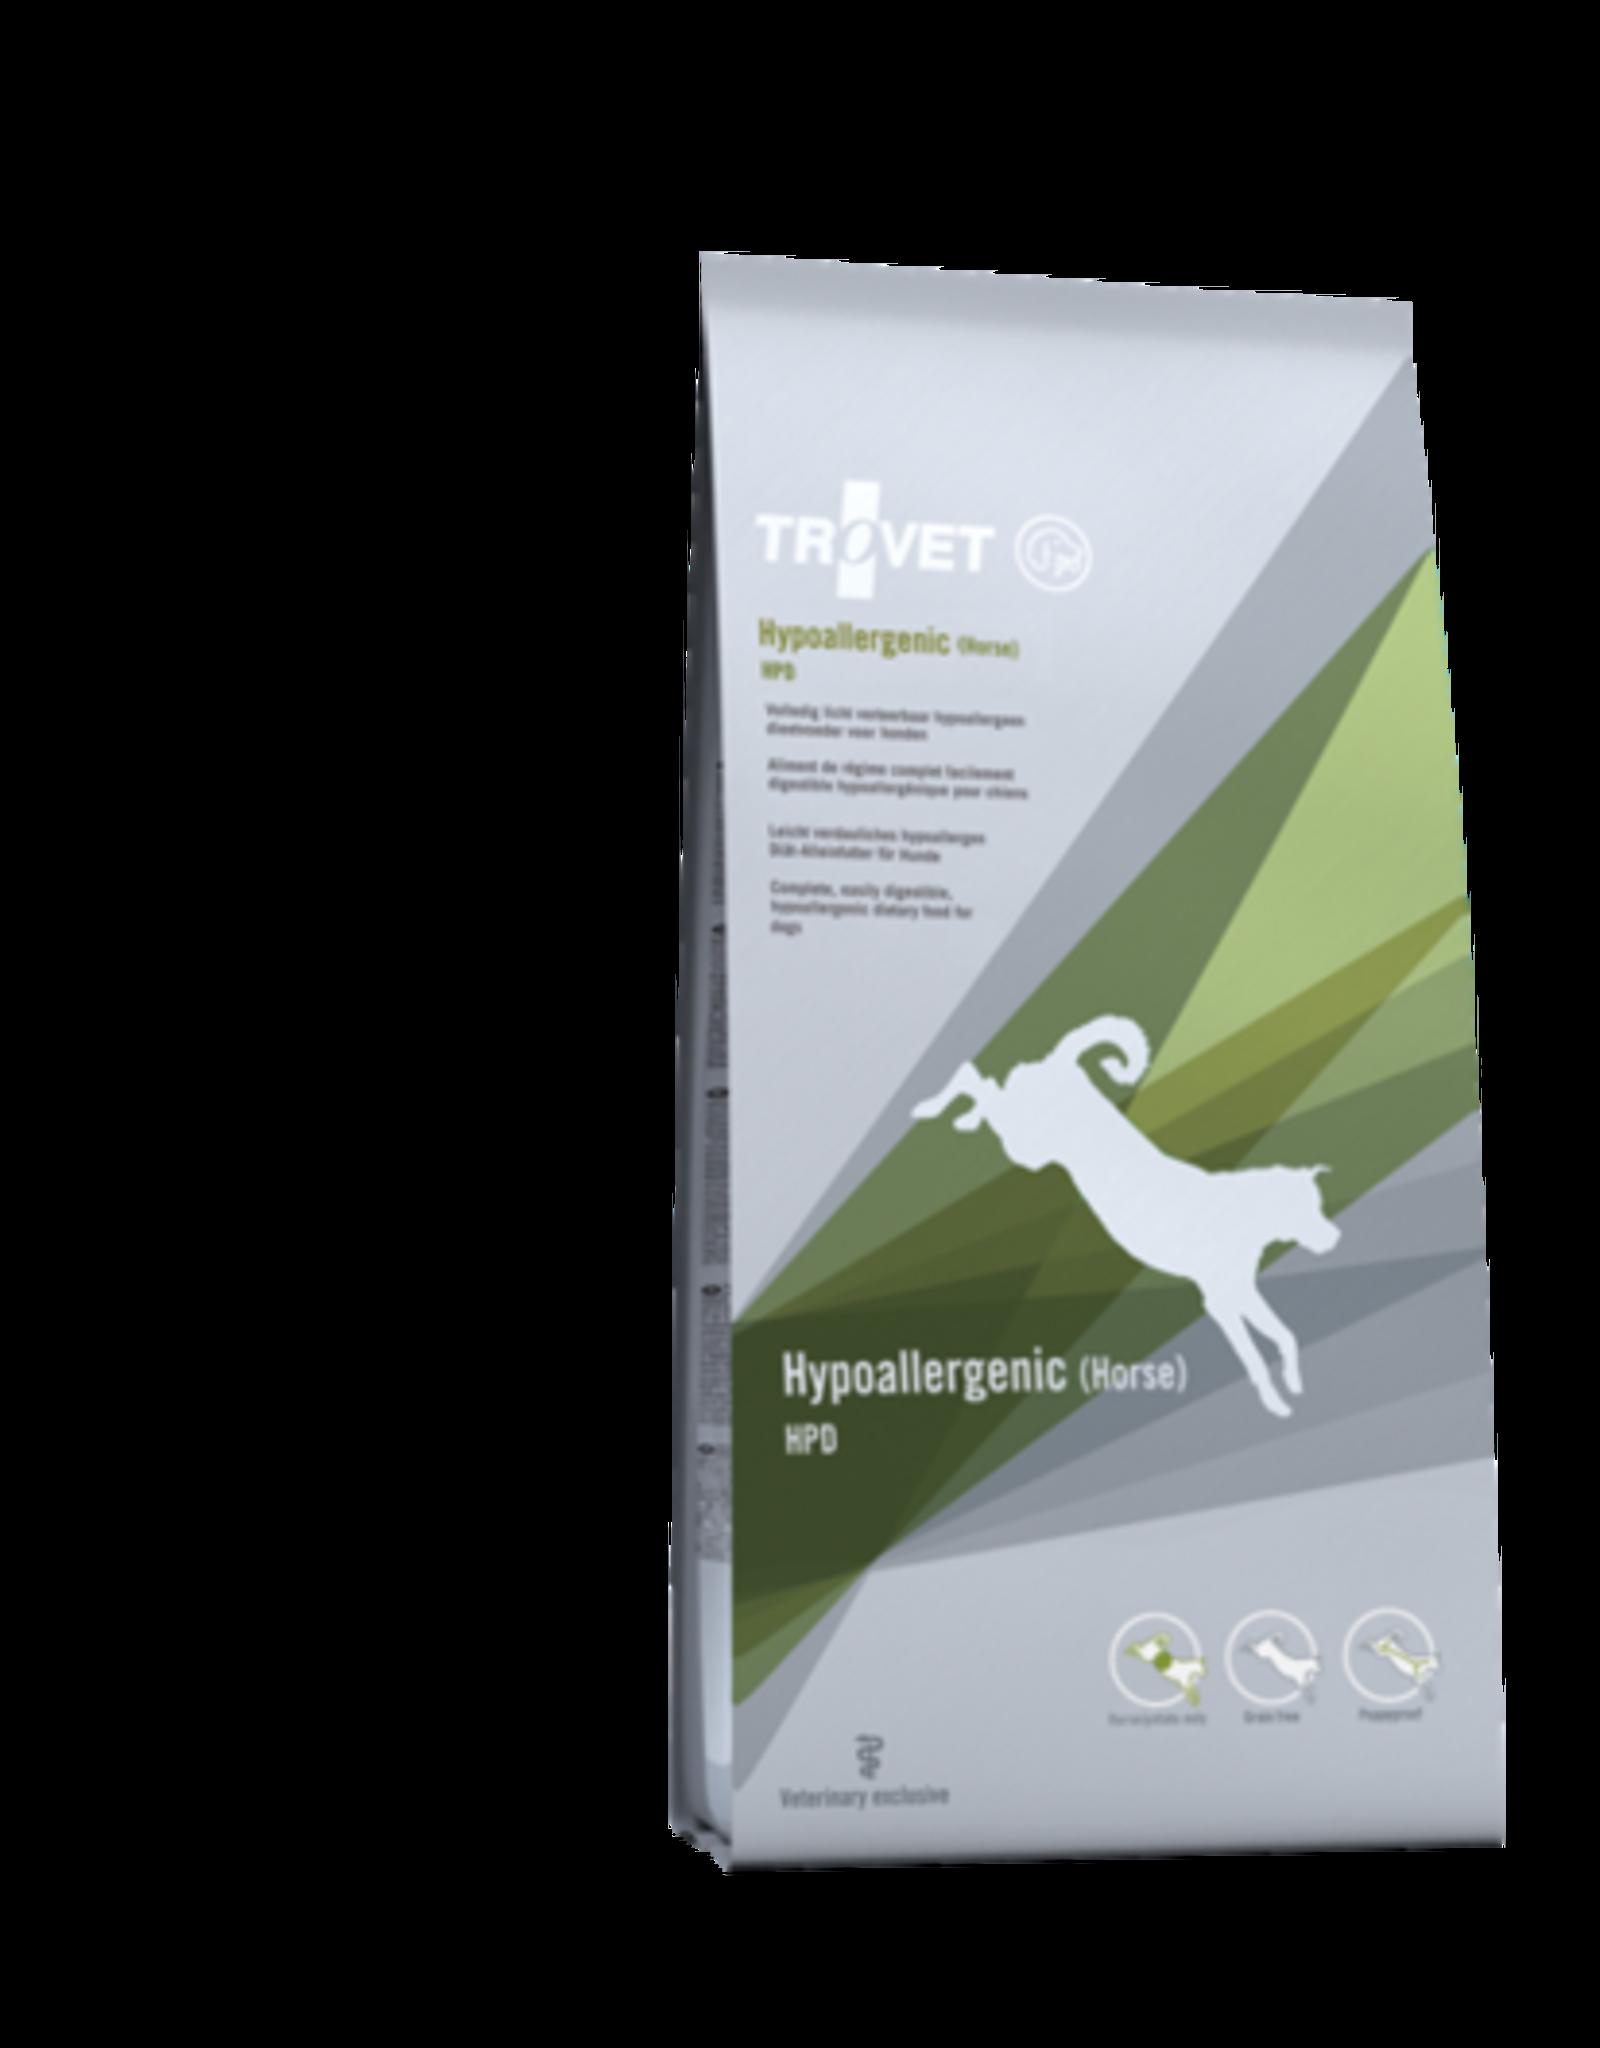 Trovet Trovet Canine Hpd Hypoallergenic Horse 3kg